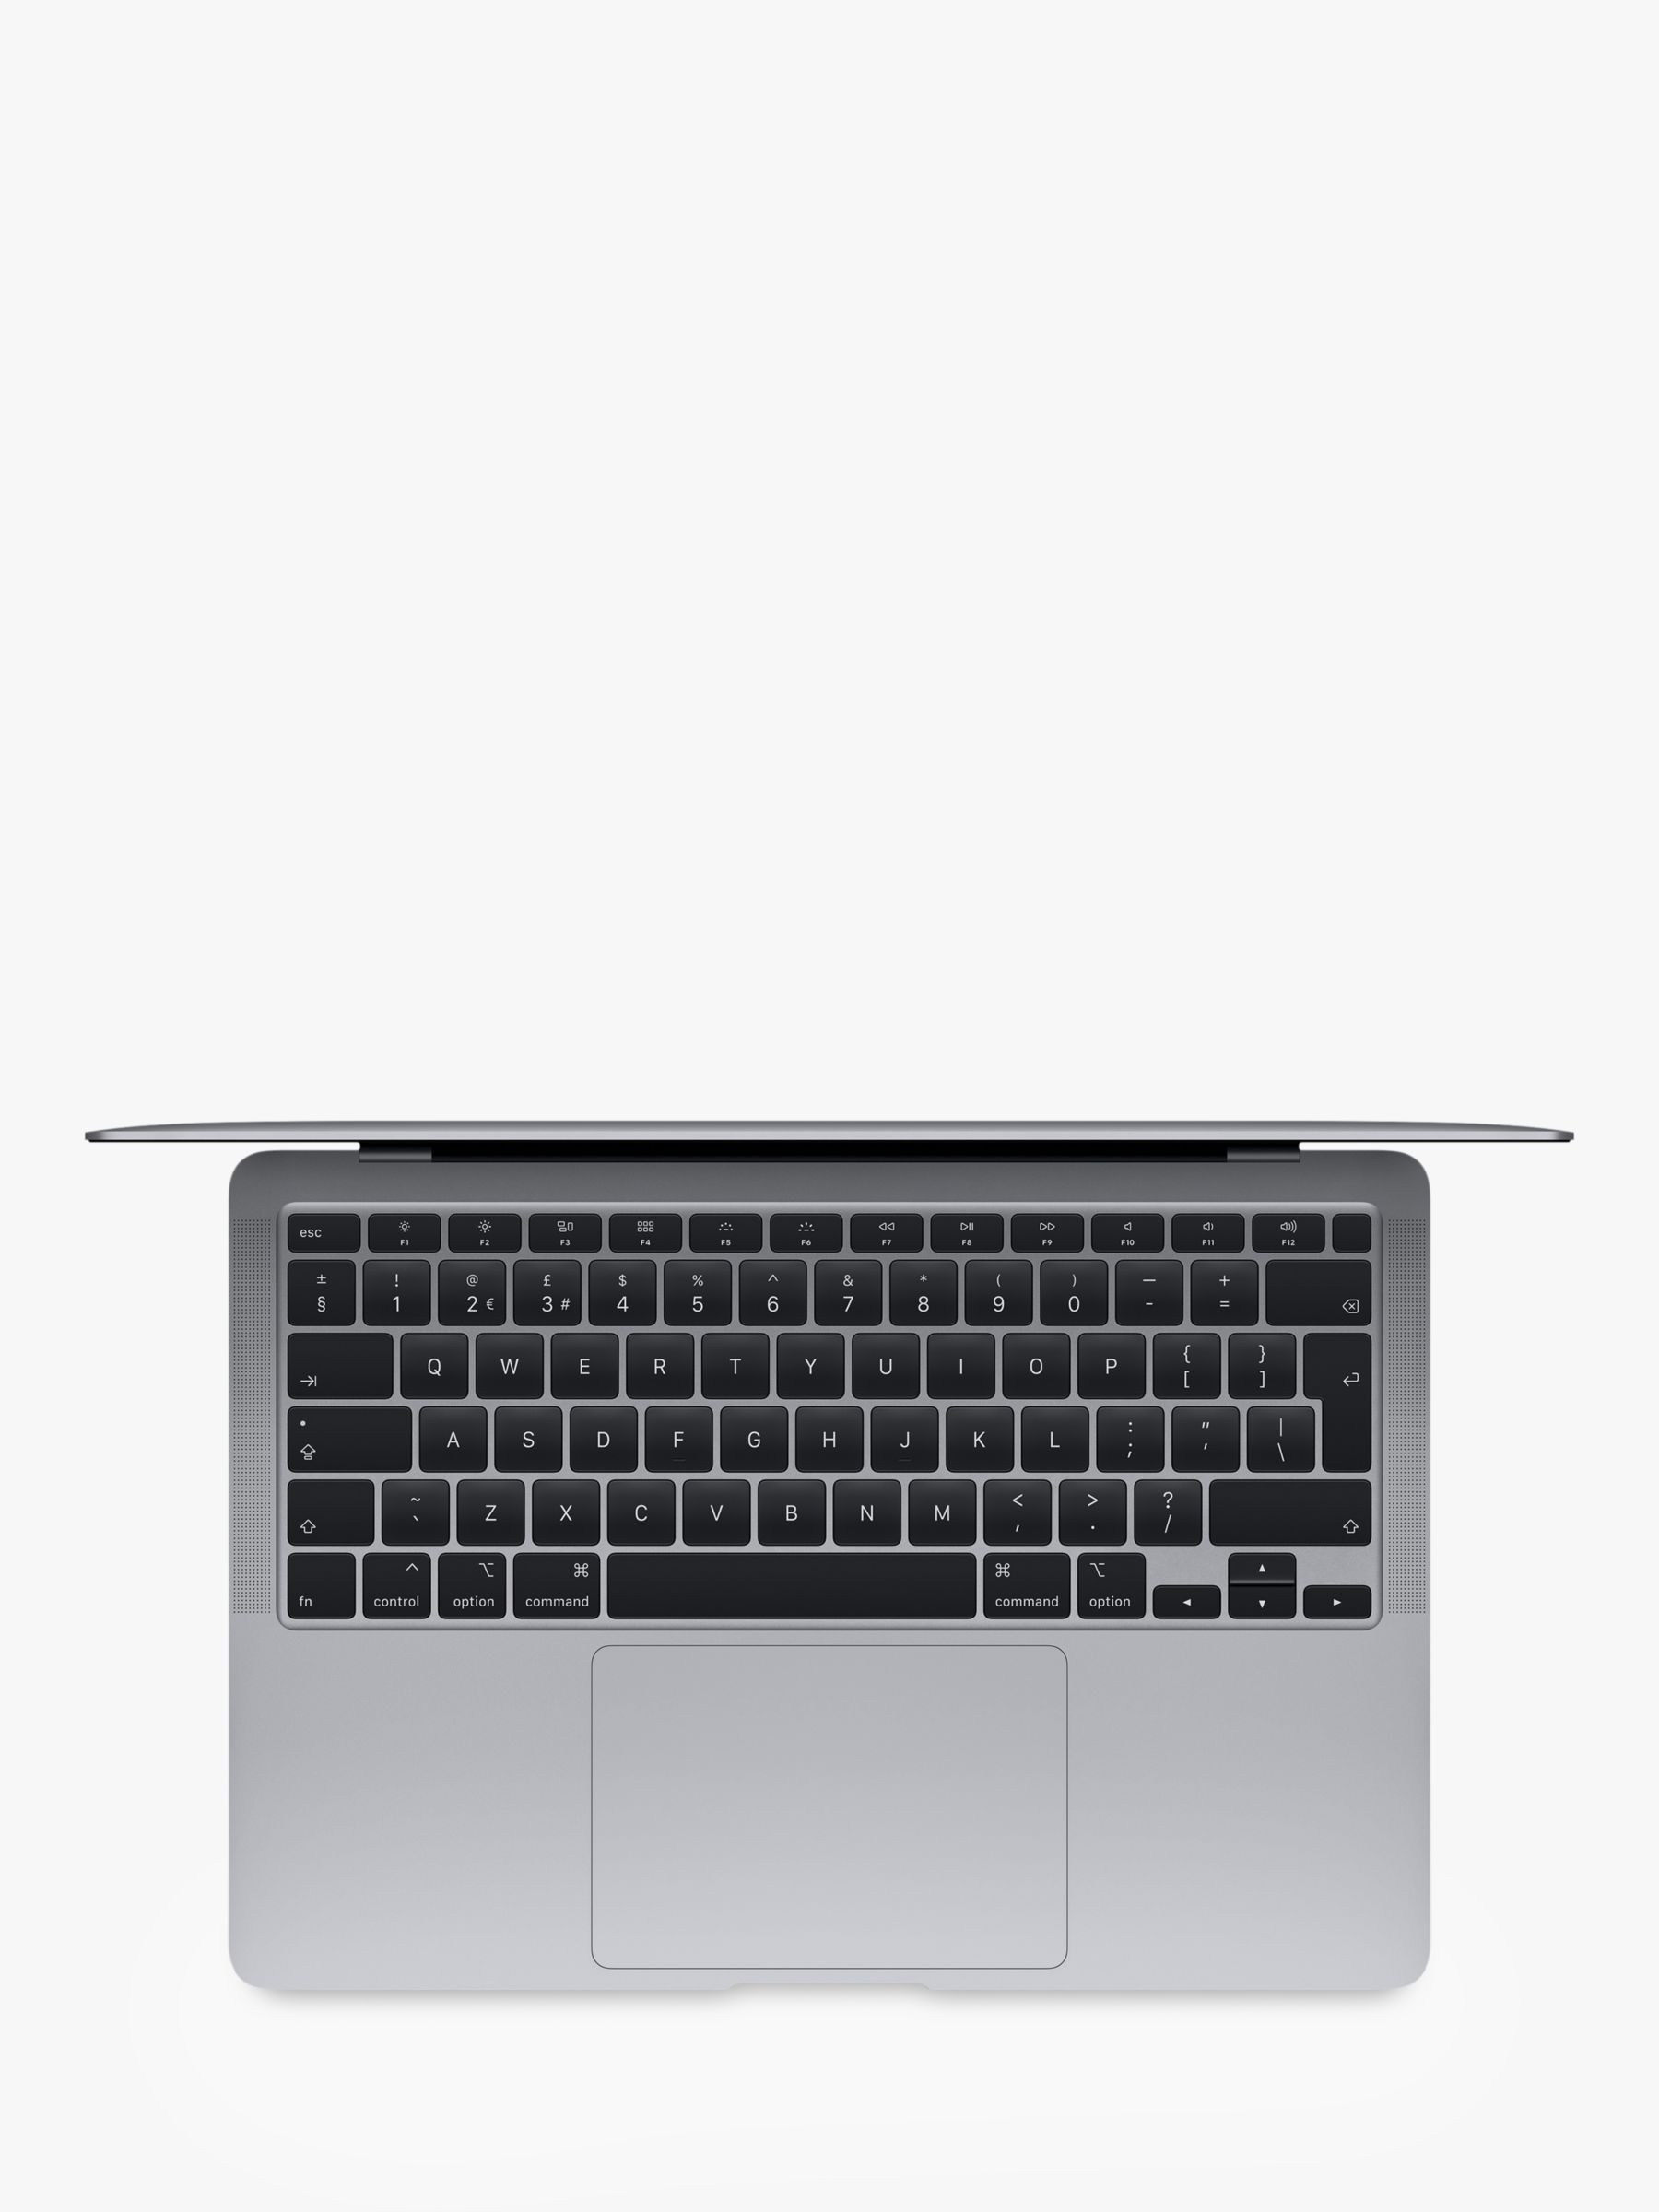 Pin On Macbook Pro Wallpaper Desktop Wallpapers In 2020 Apple Macbook Air Apple Macbook Macbook